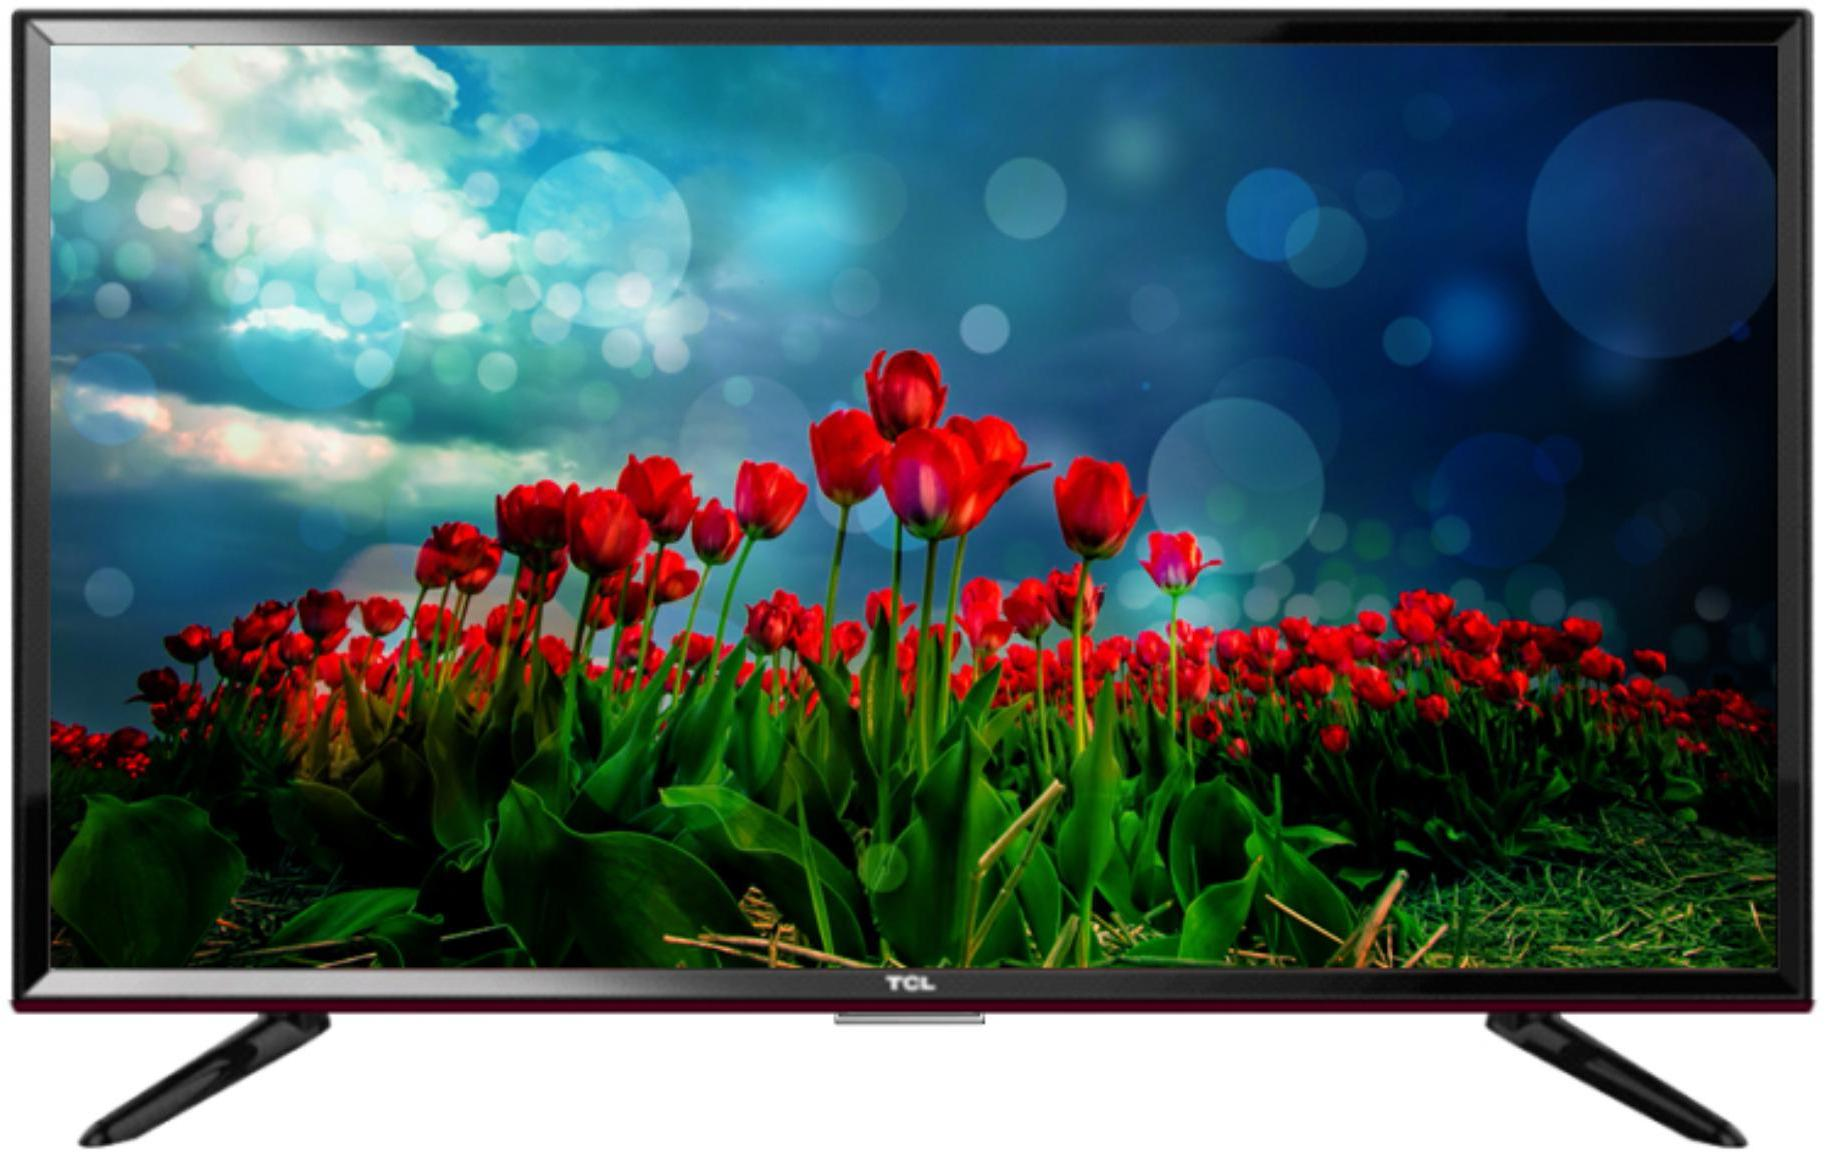 TCL 29 Inch TV LED L29D2900